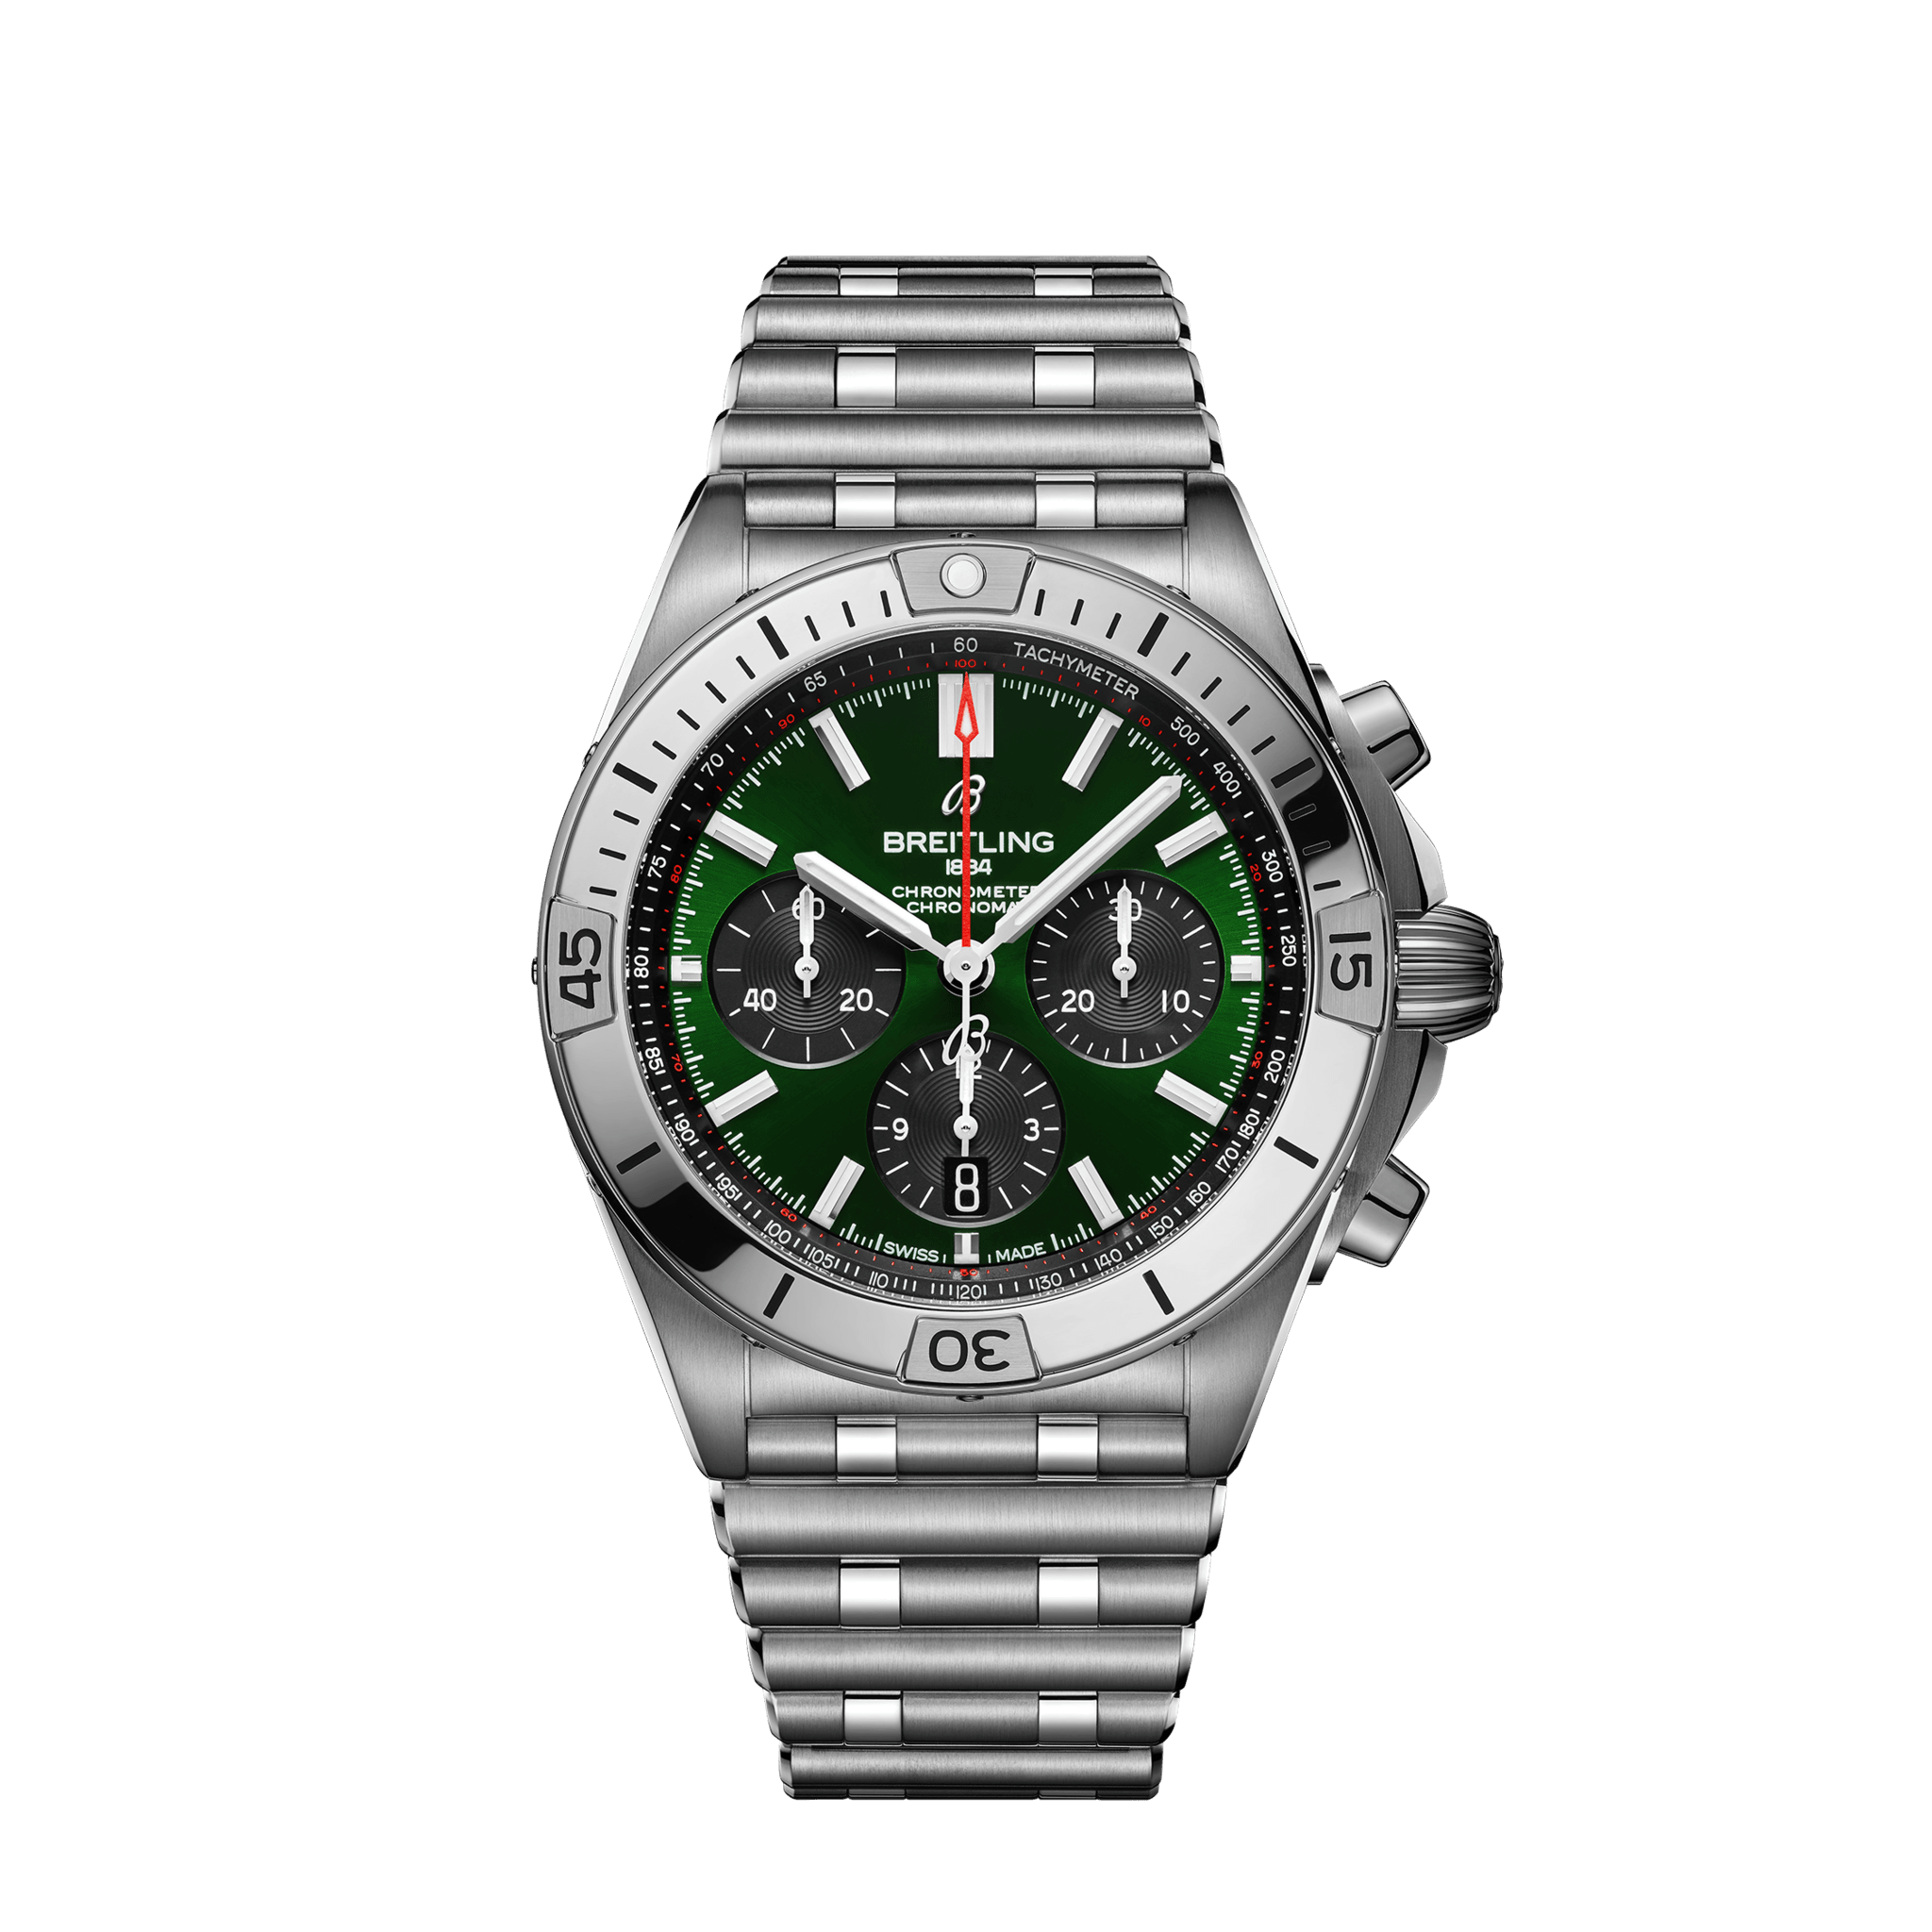 Breitling Chronomat B01 42 Bentley - grün